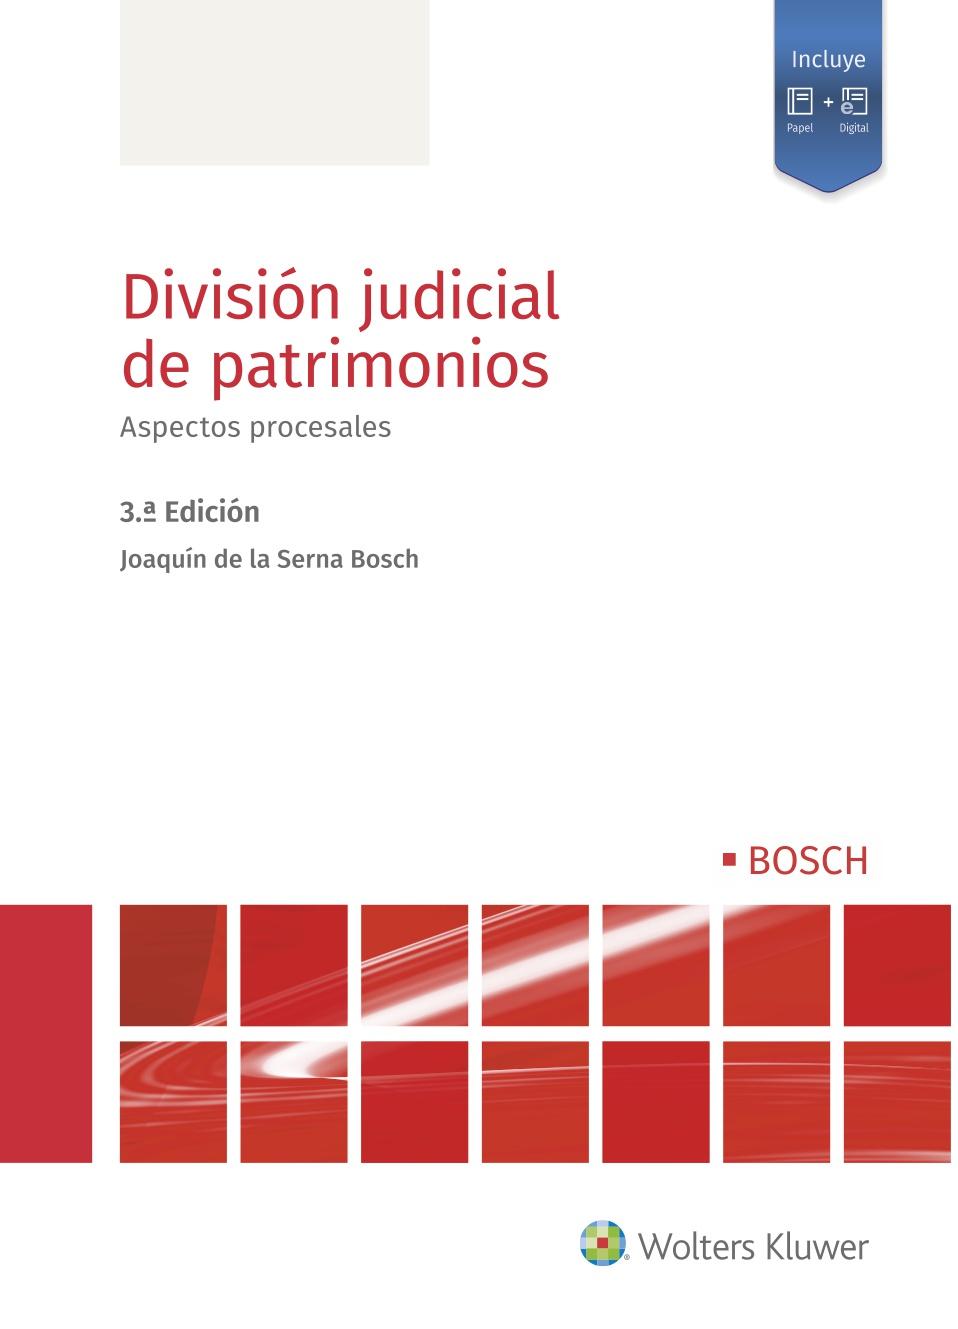 División judicial de patrimonios   «Aspectos procesales (3ª edición)»